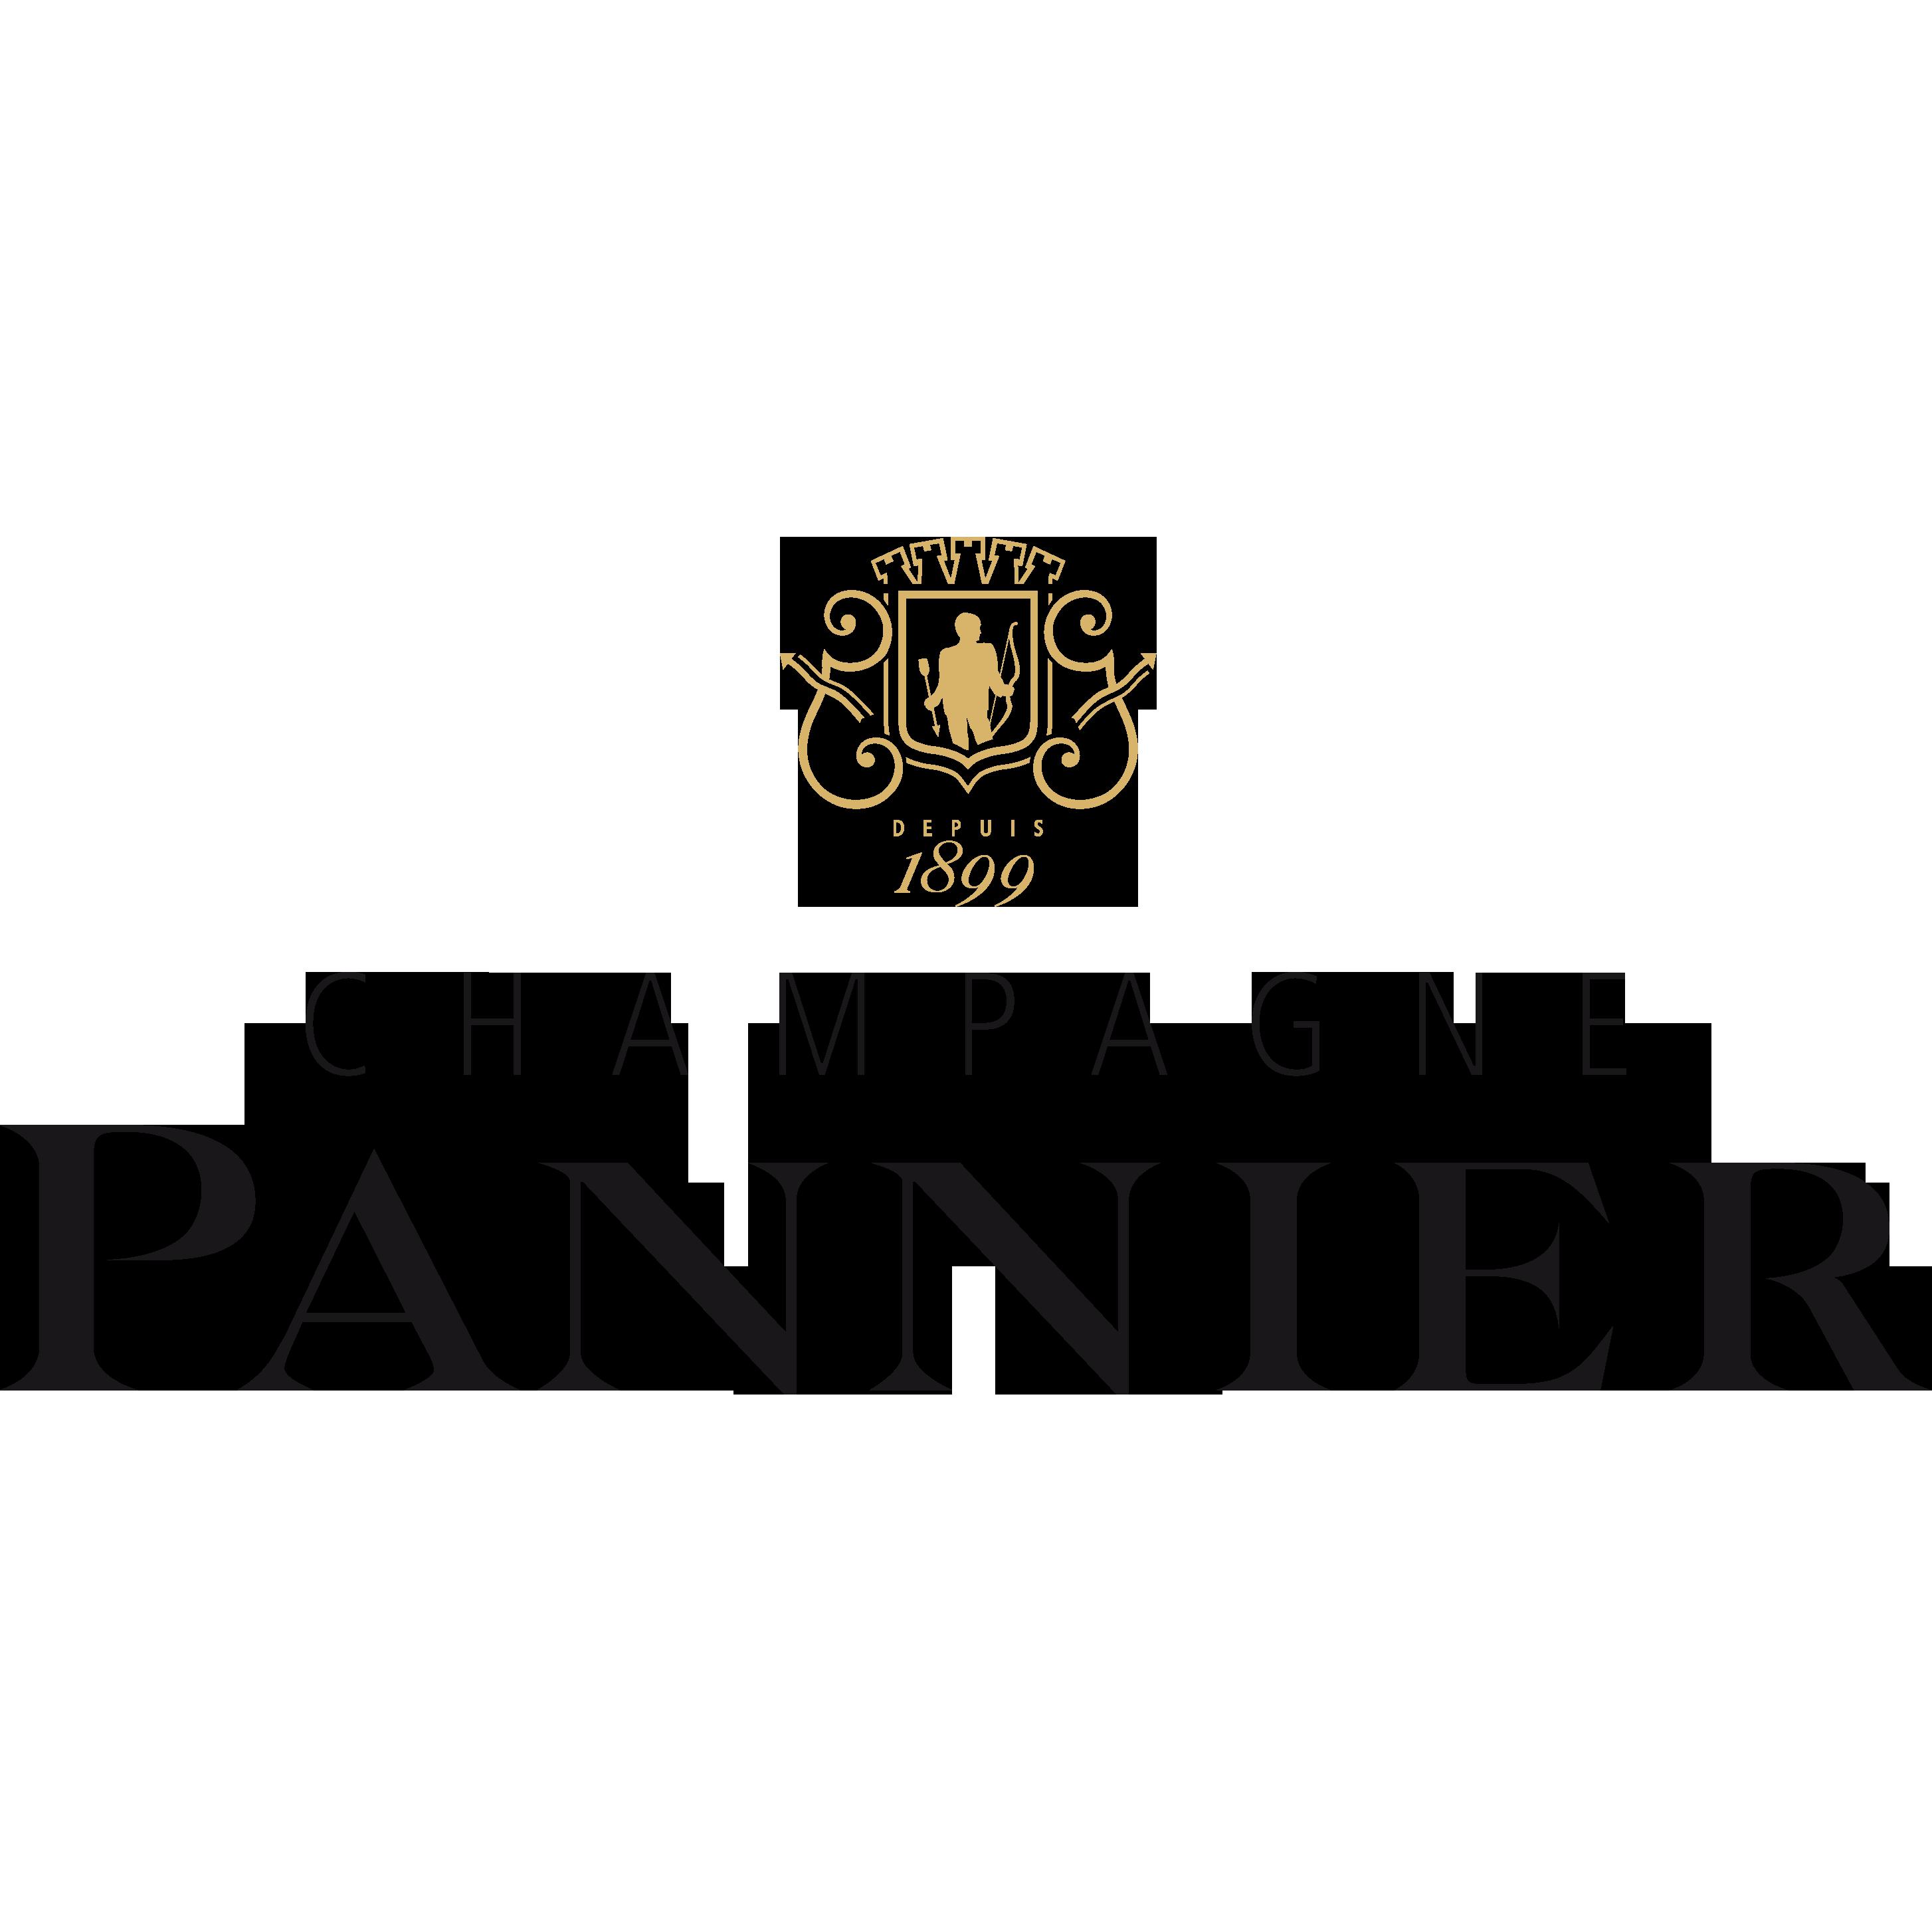 CHAMPAGNE PANNIER